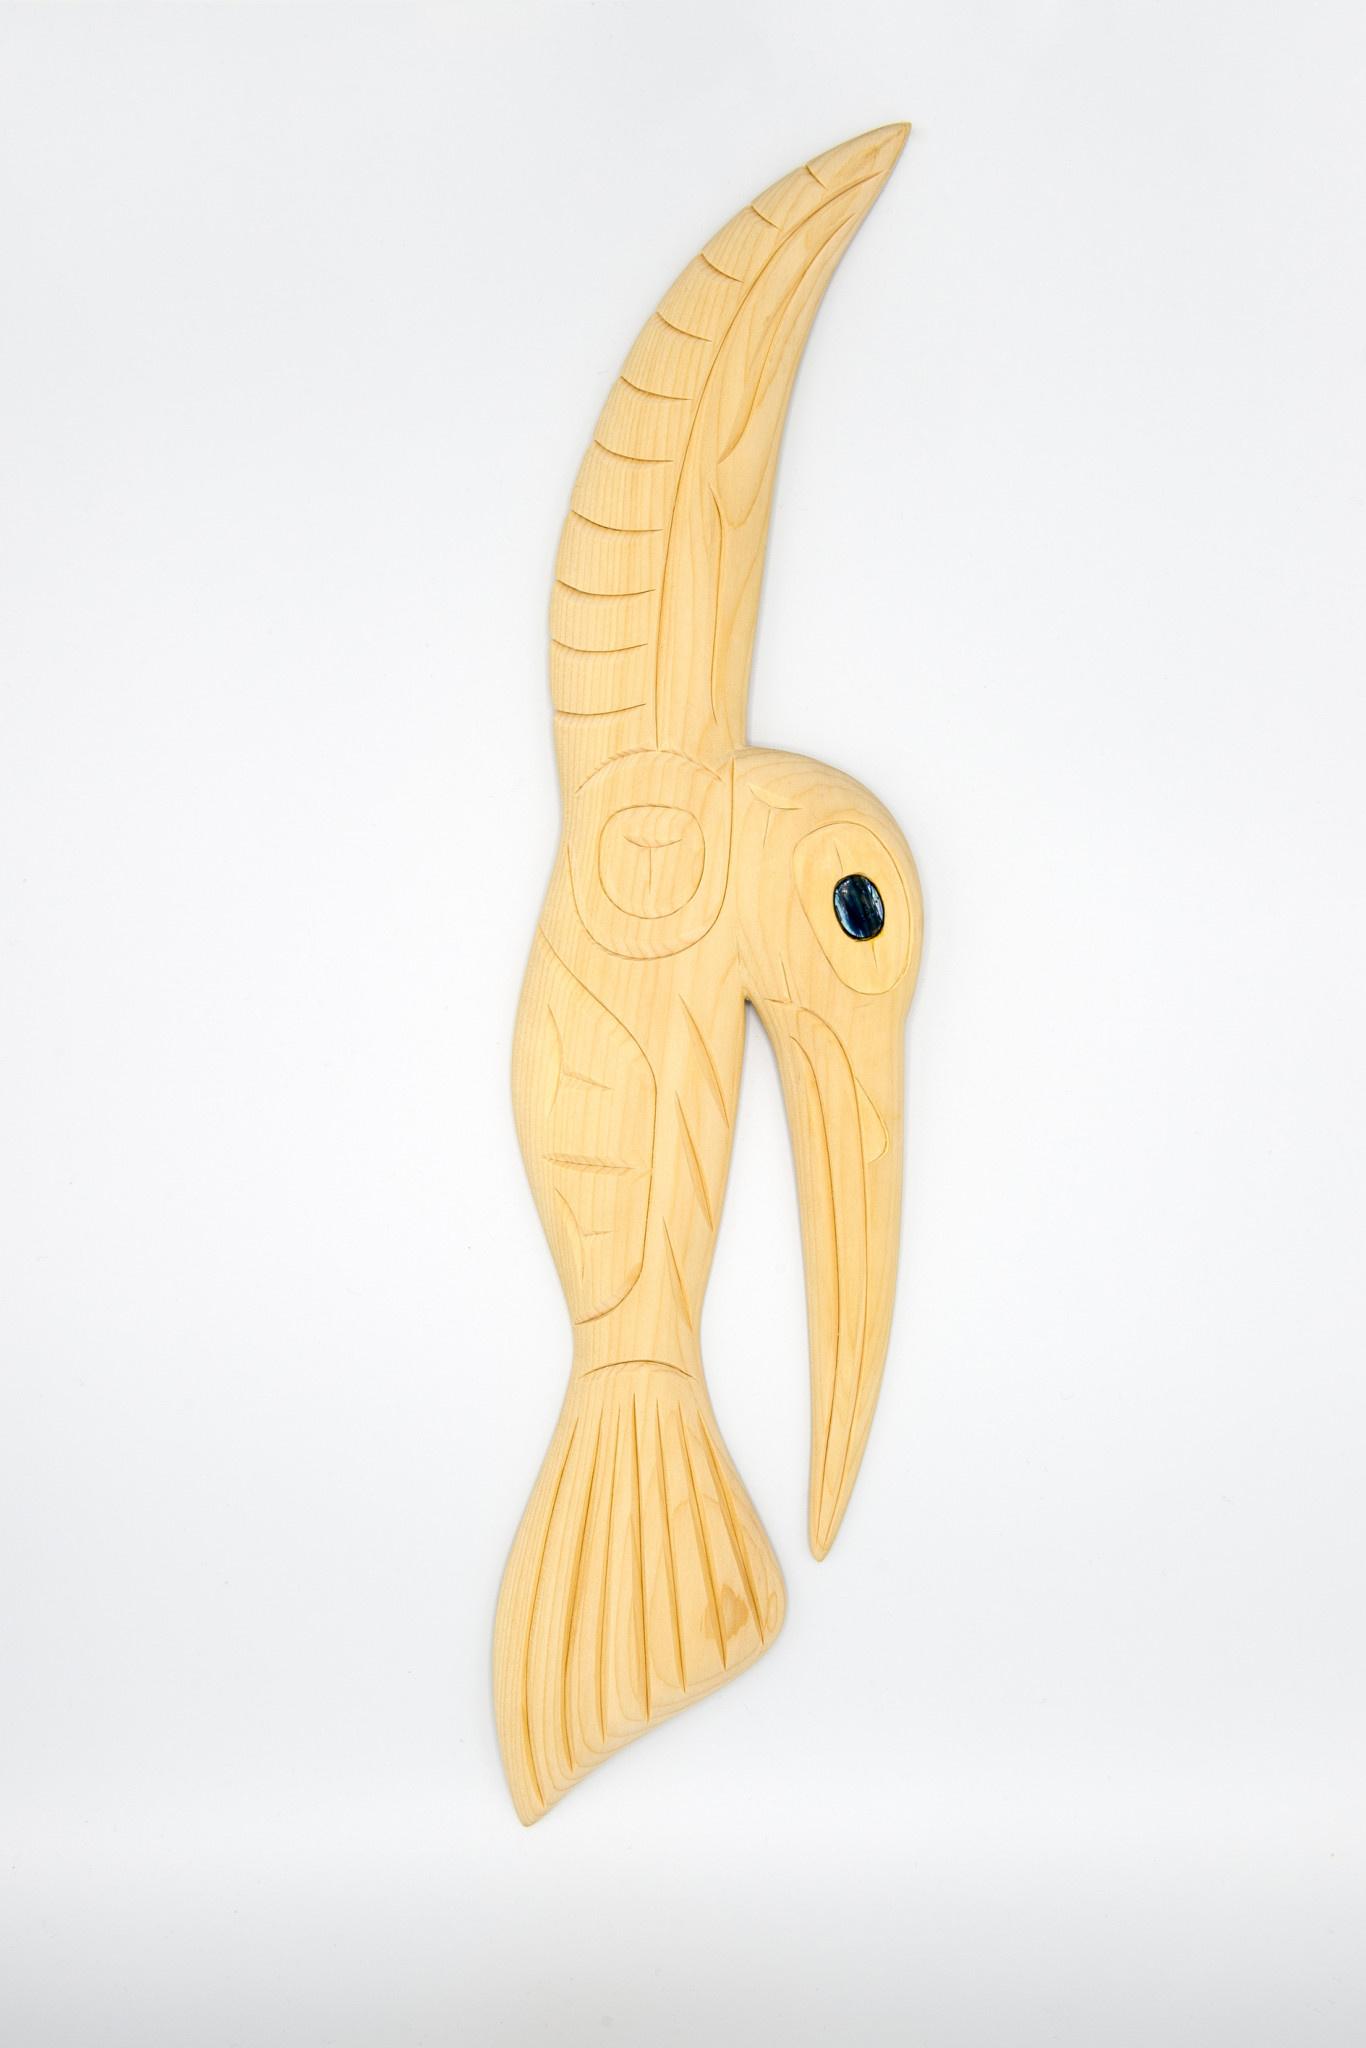 Steve Hoffmann Harvey John - Cedar Carving - Flat Hummingbird - Clear